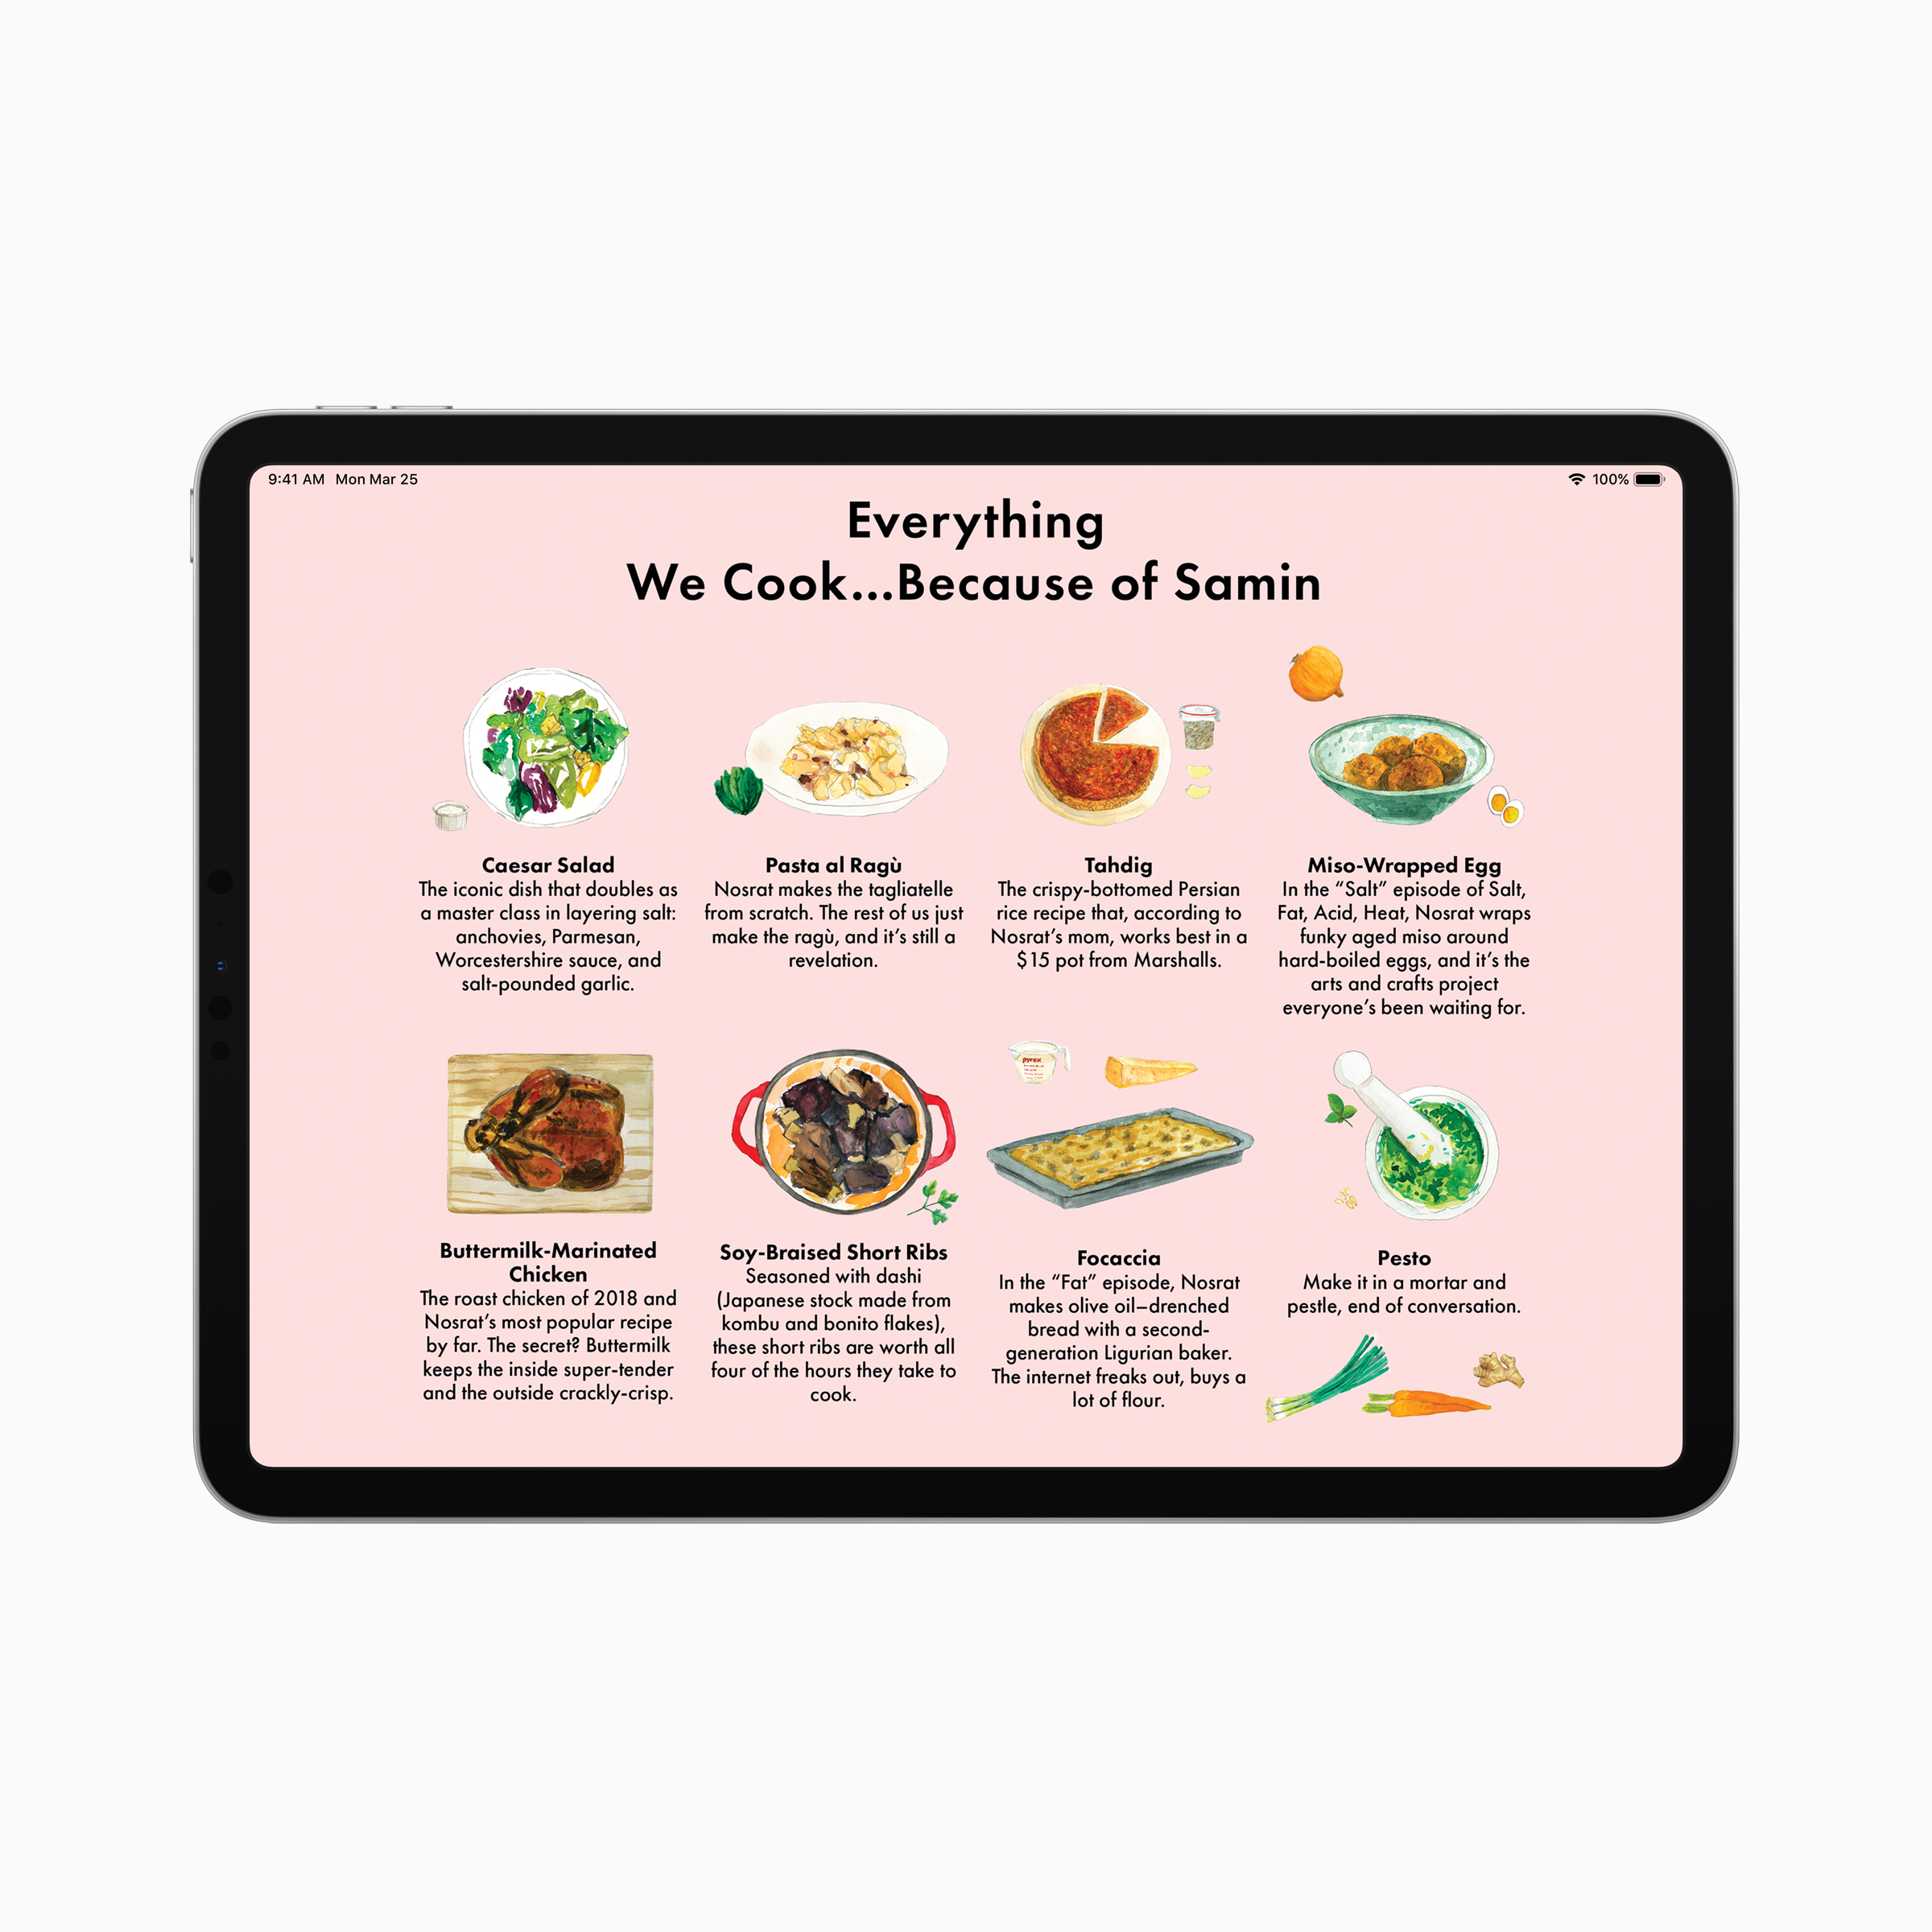 Apple-news-plus-bon-appetit-ipad-screen-03252019.jpg